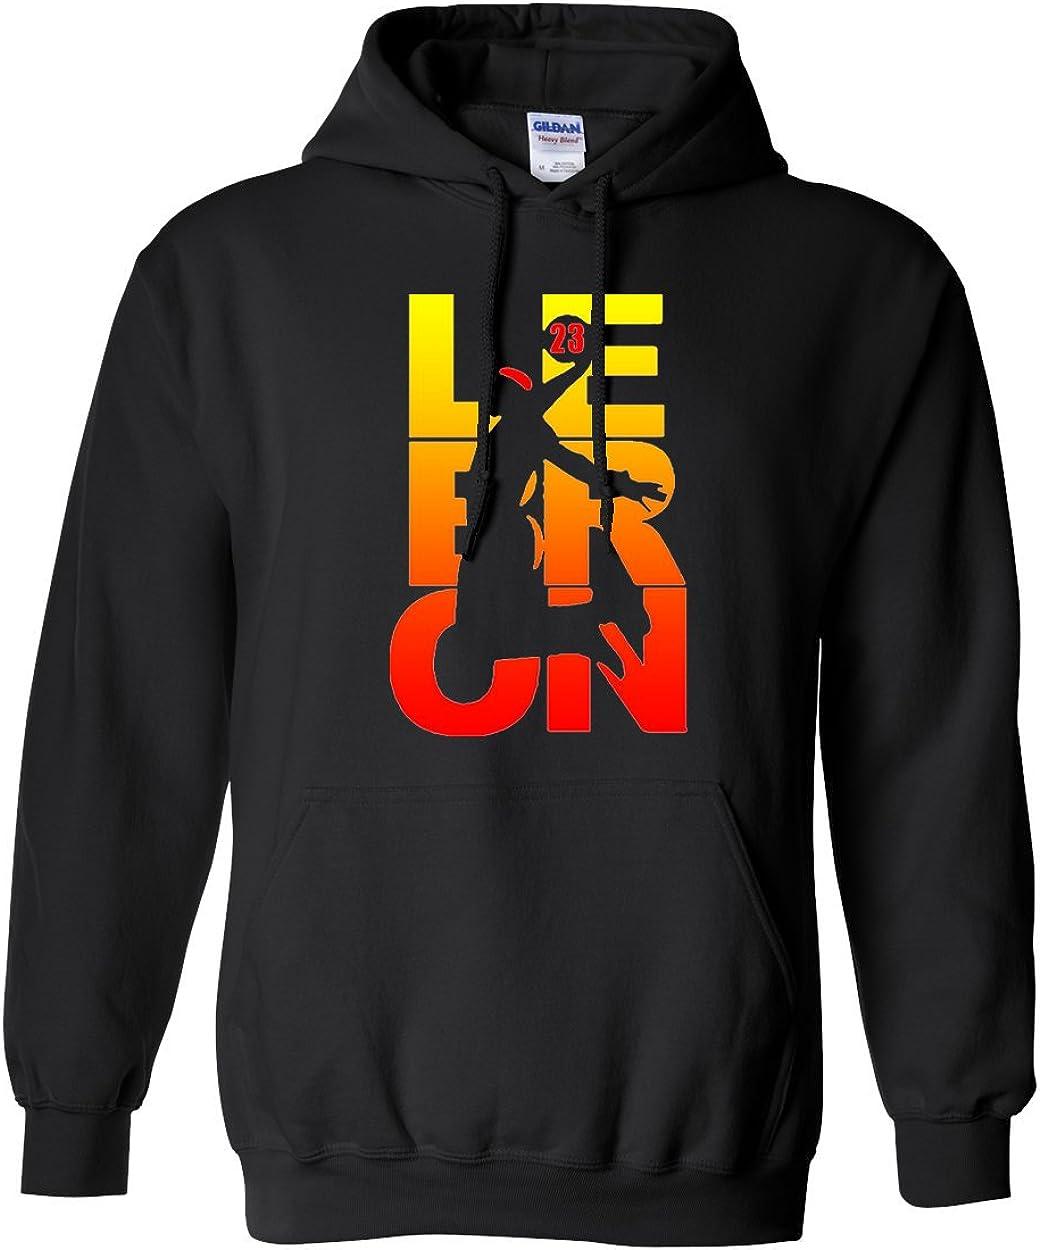 City Shirts New 4 years warranty Lebron Fan Wear 2021 model Los Angles 23 Multicol Cleveland